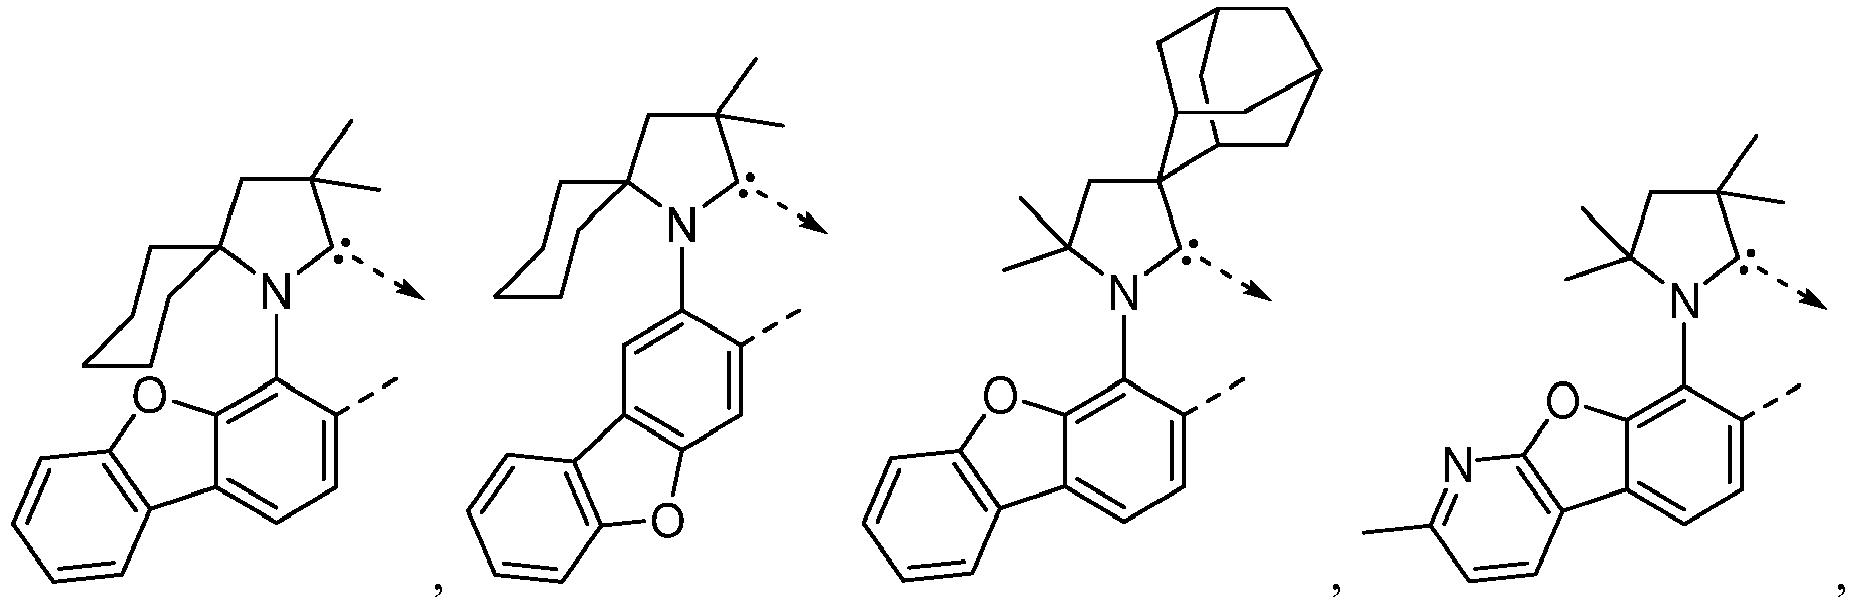 Figure imgb0970